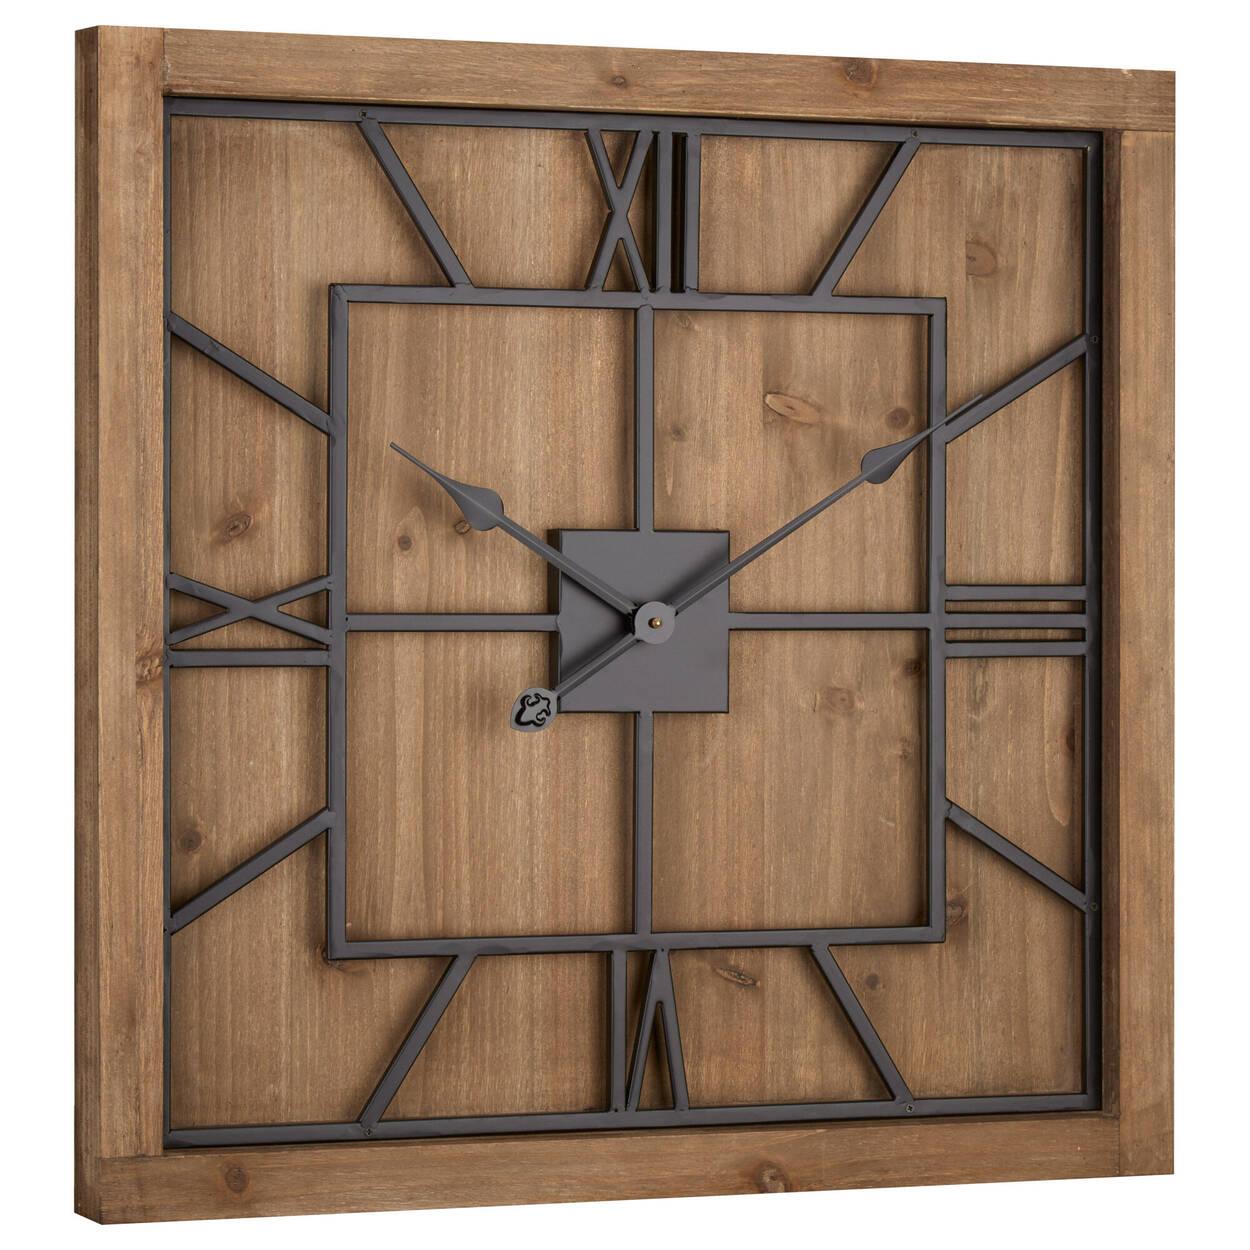 Wood and Metal Square Clock